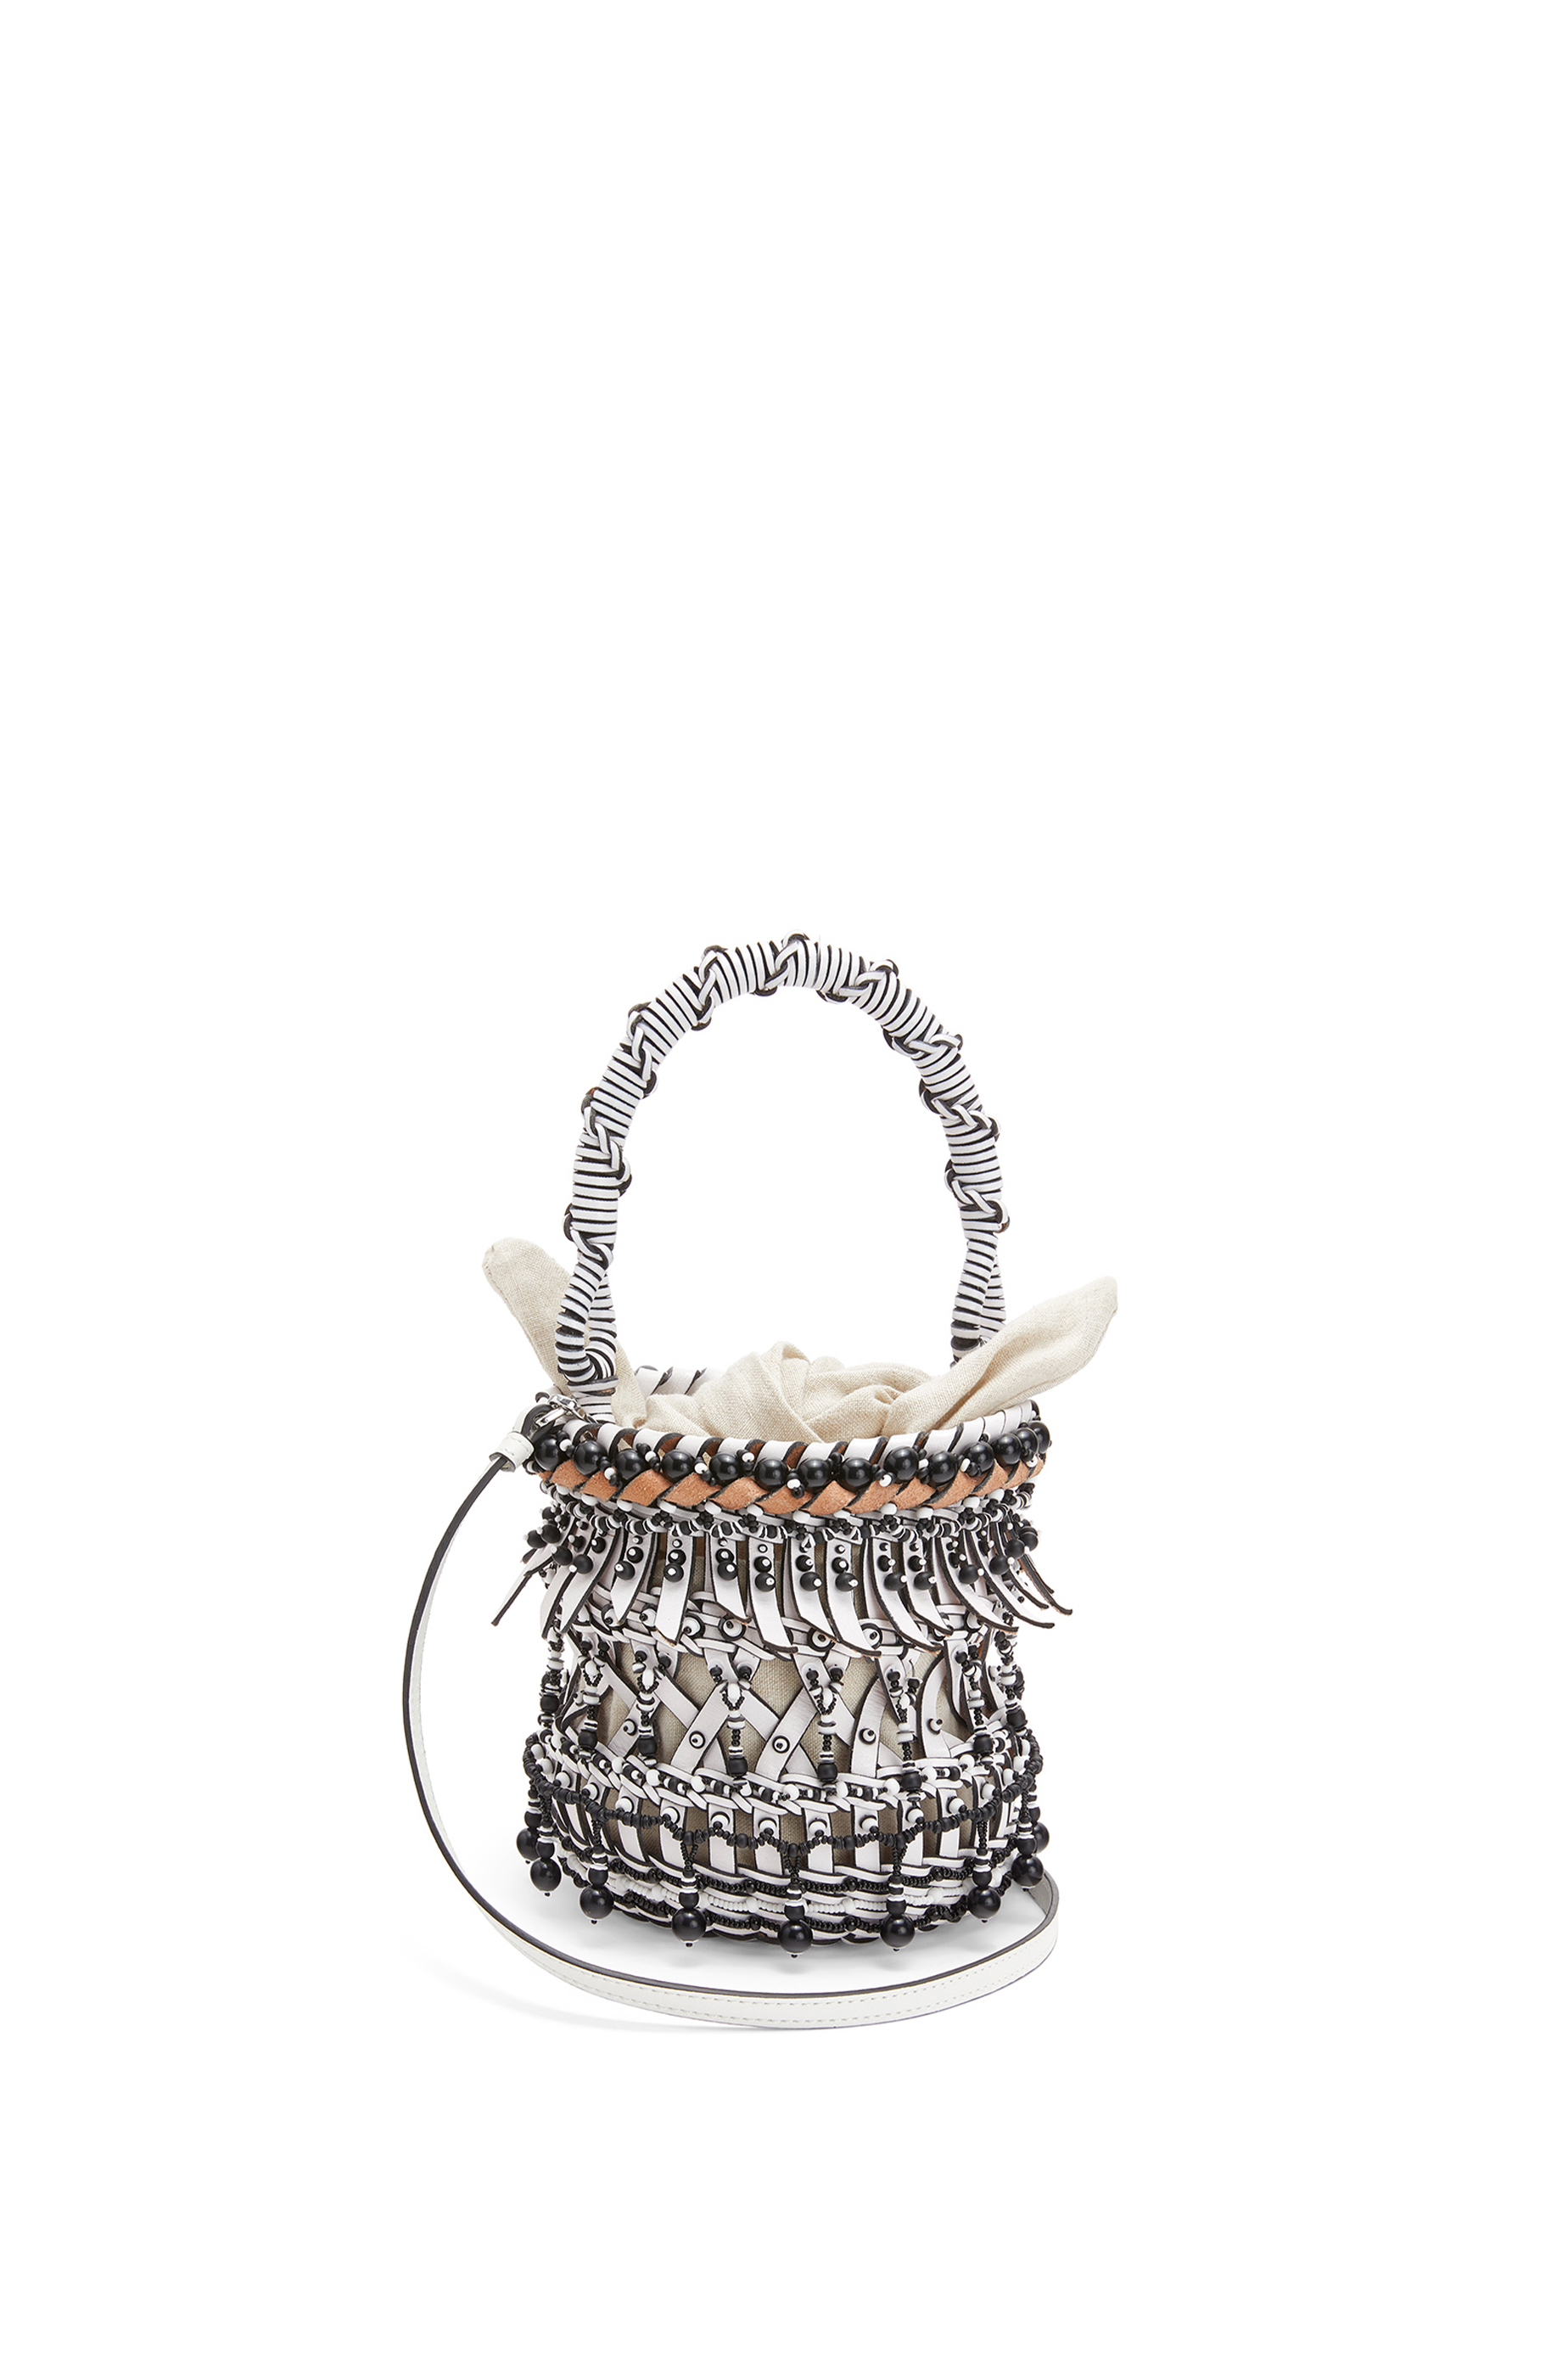 LG161 4 Large Toucan Beads